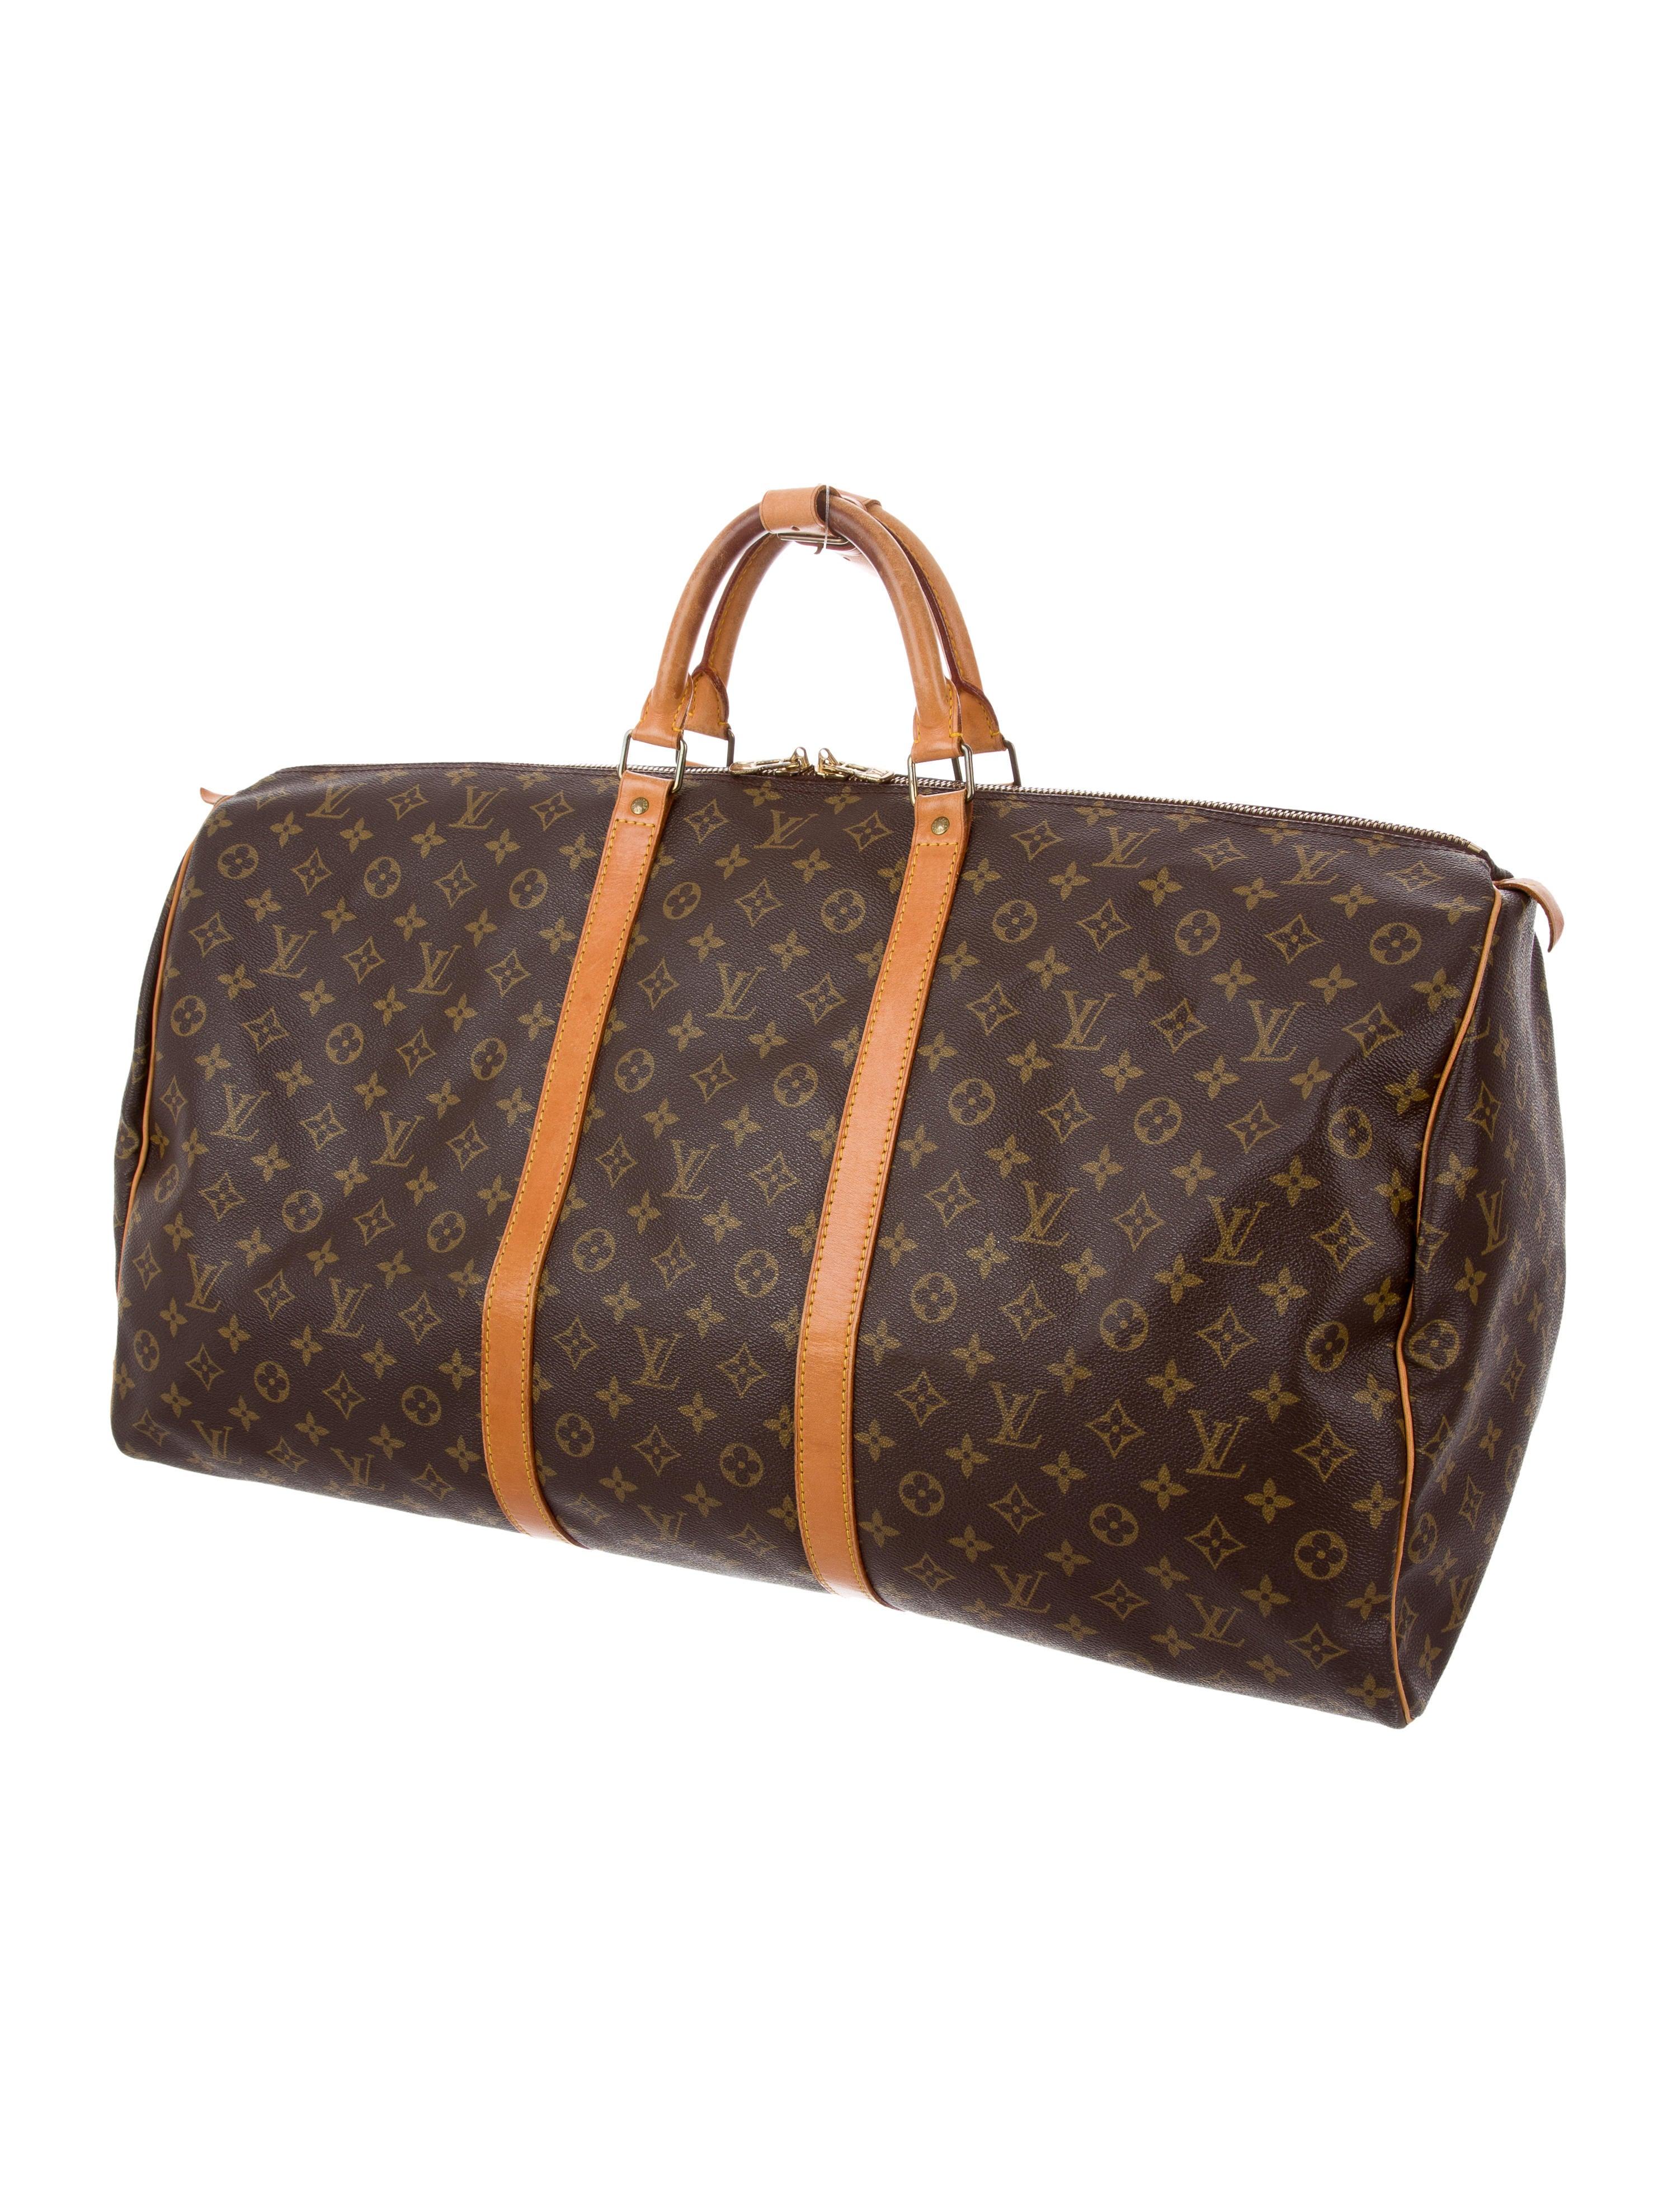 louis vuitton monogram keepall 60 handbags lou139637. Black Bedroom Furniture Sets. Home Design Ideas